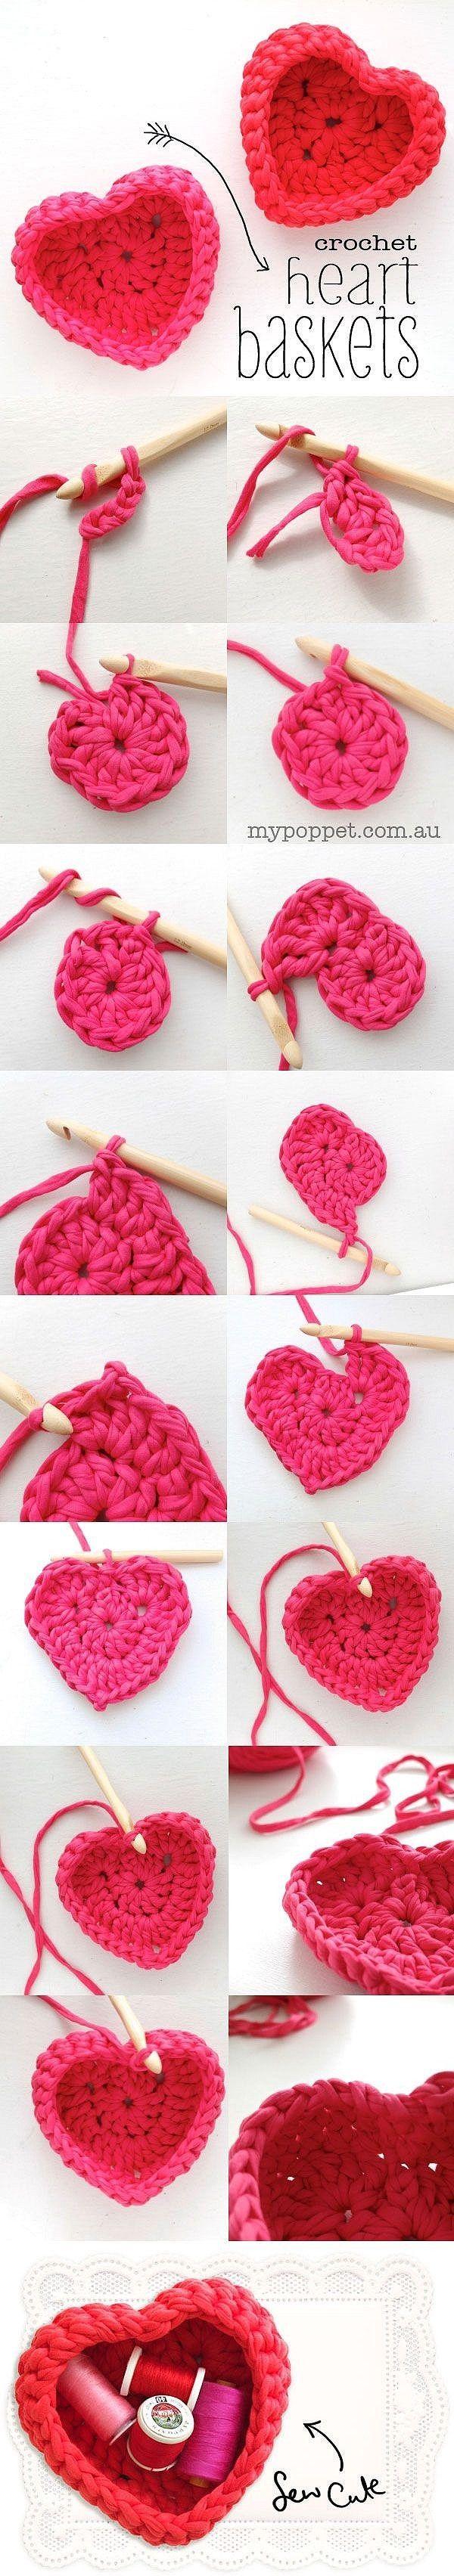 Crocheted heart baskets.